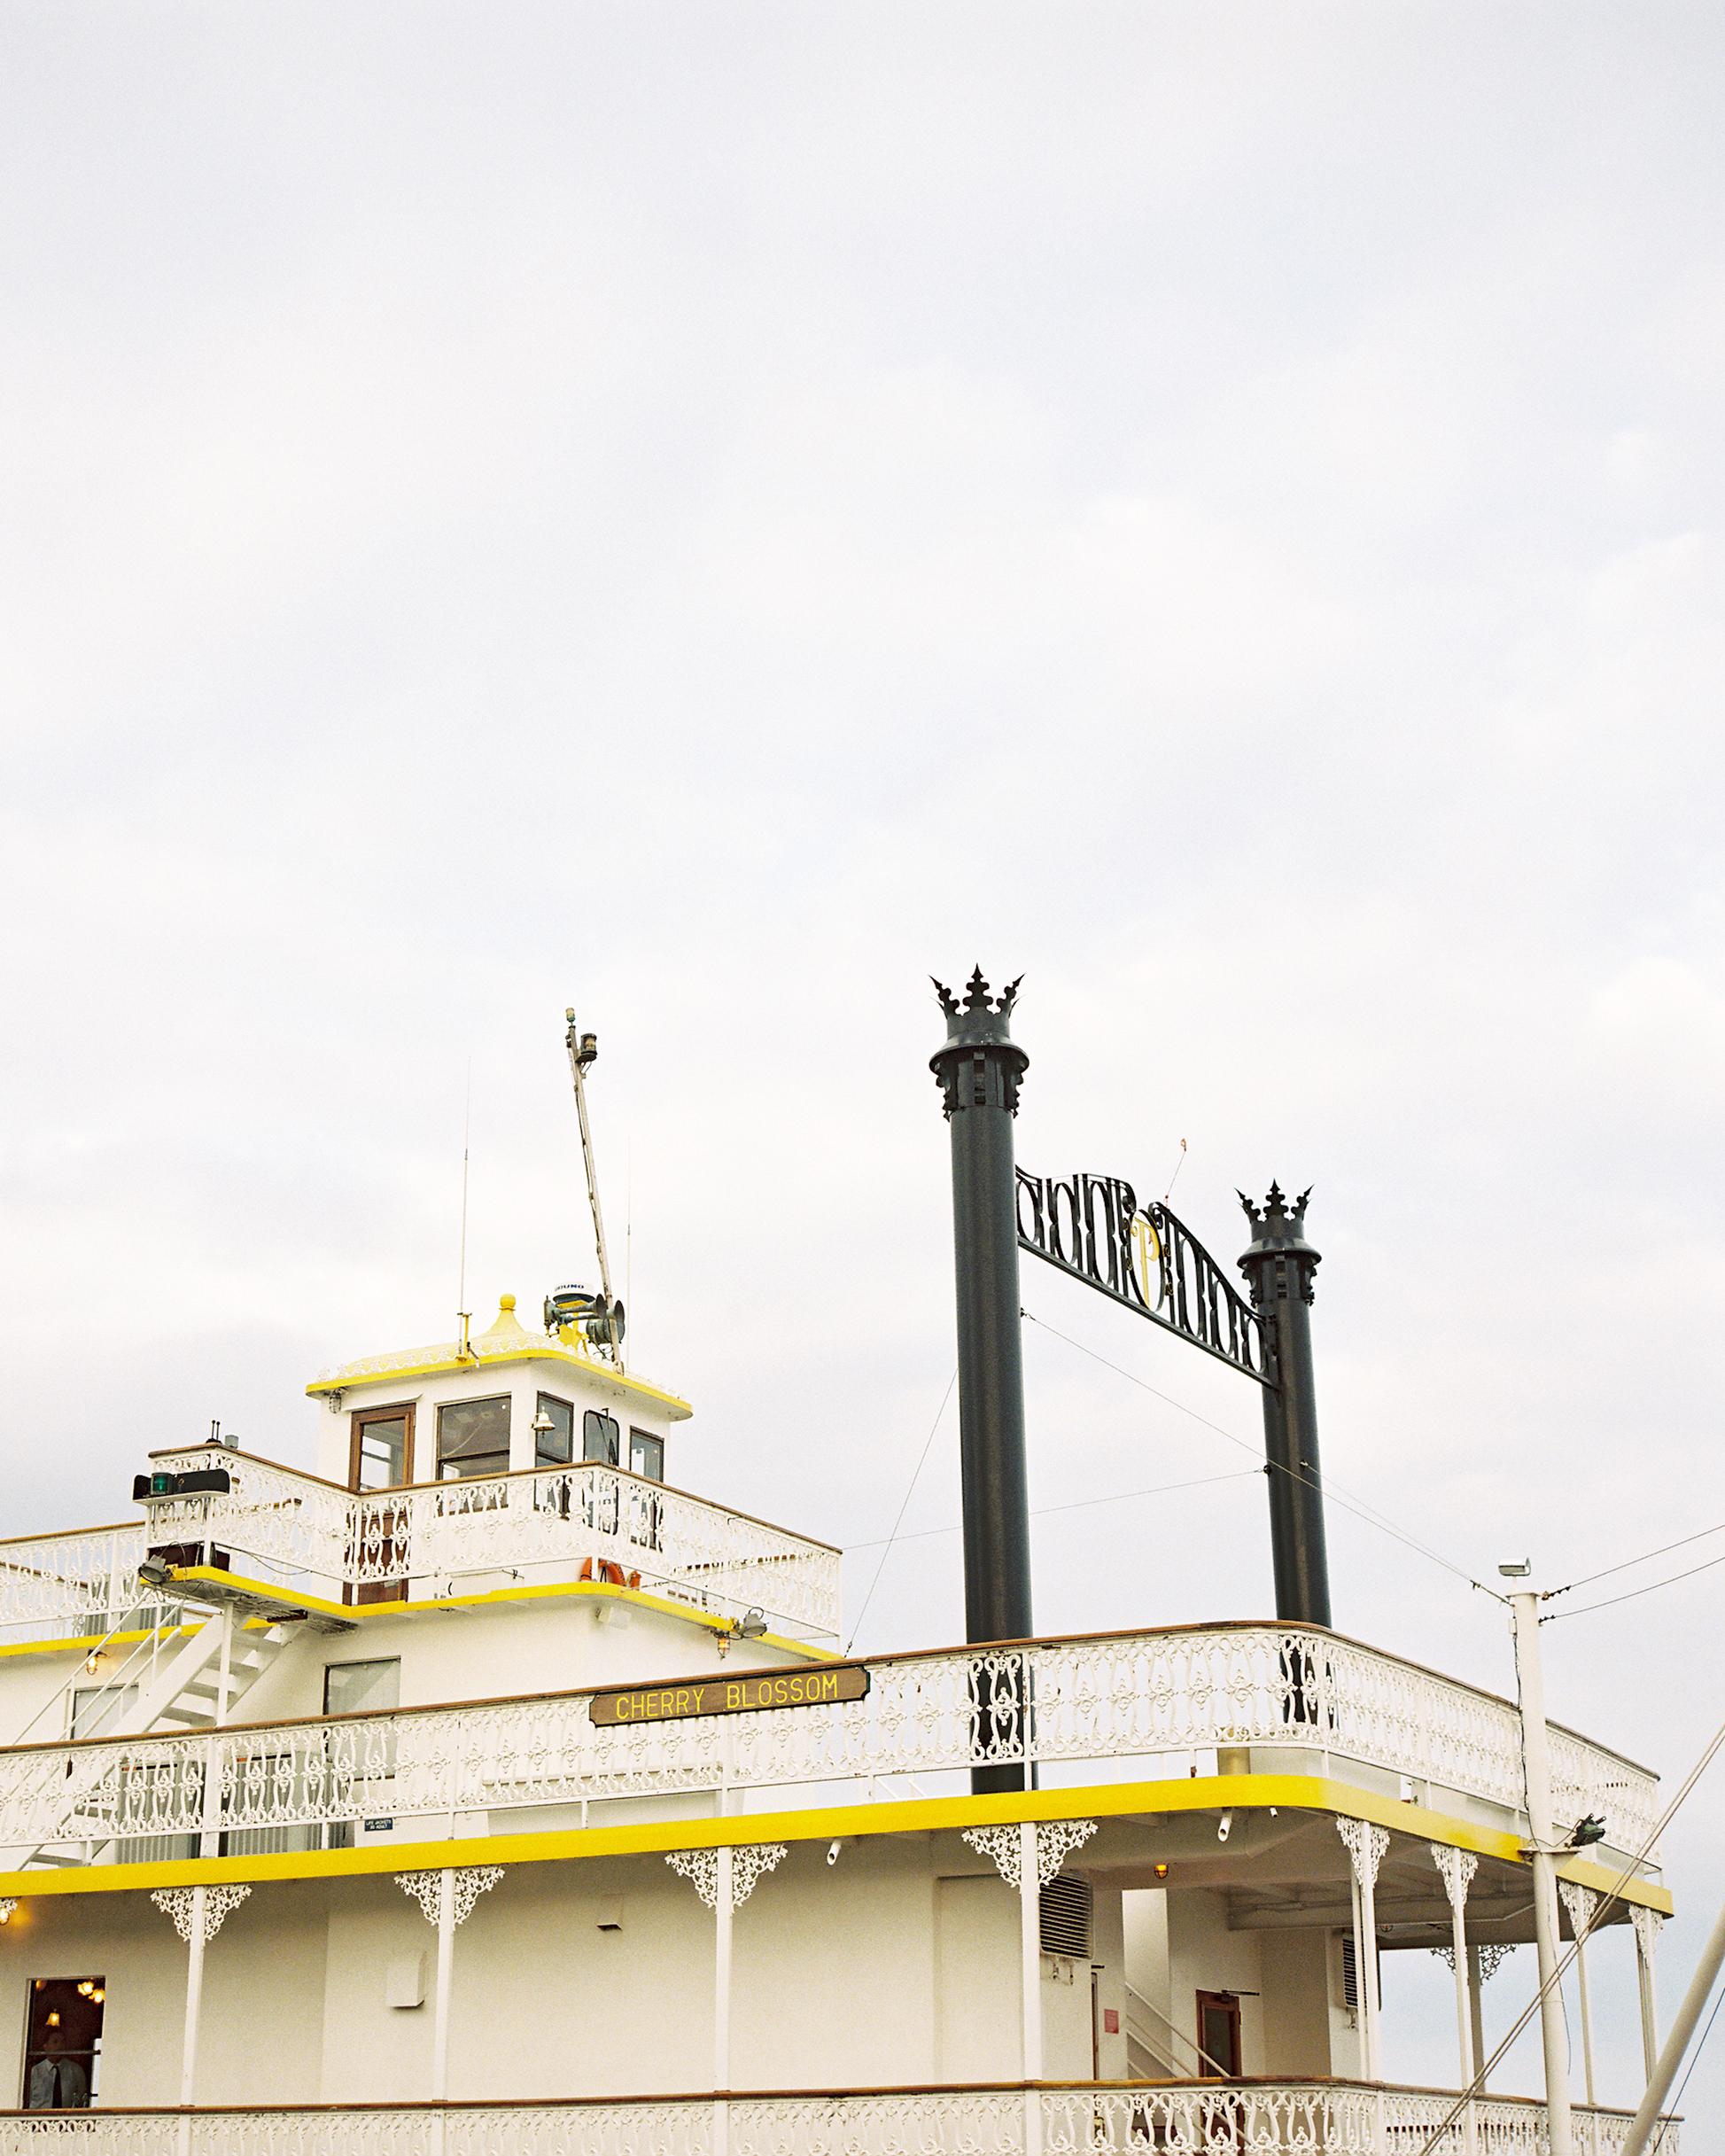 beth-scott-wedding-boat-0010-s112077-0715.jpg